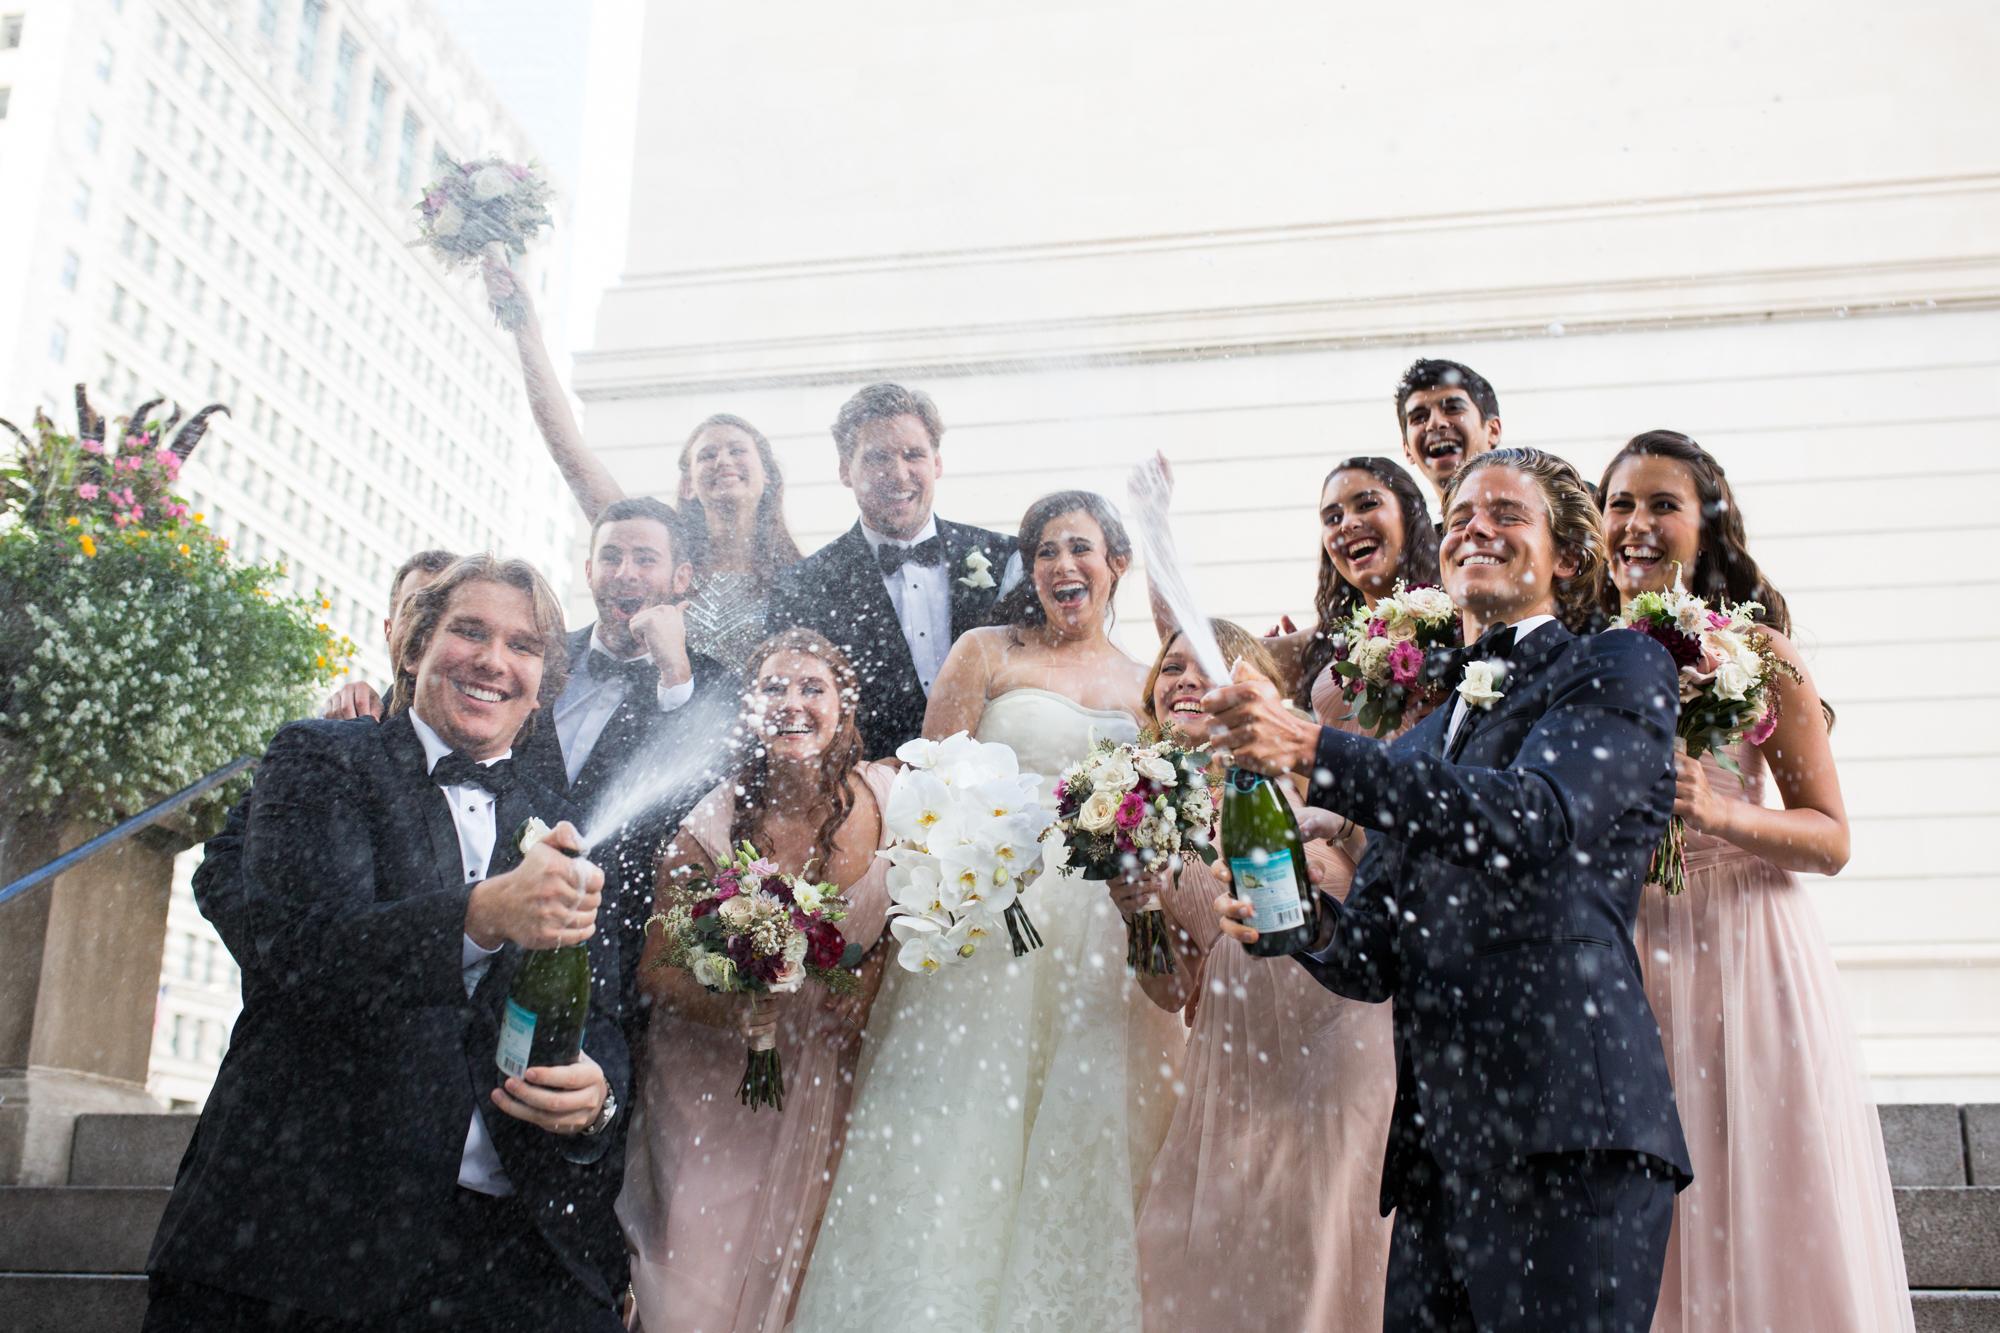 Wedding party spraying champagne at Chicago wedding